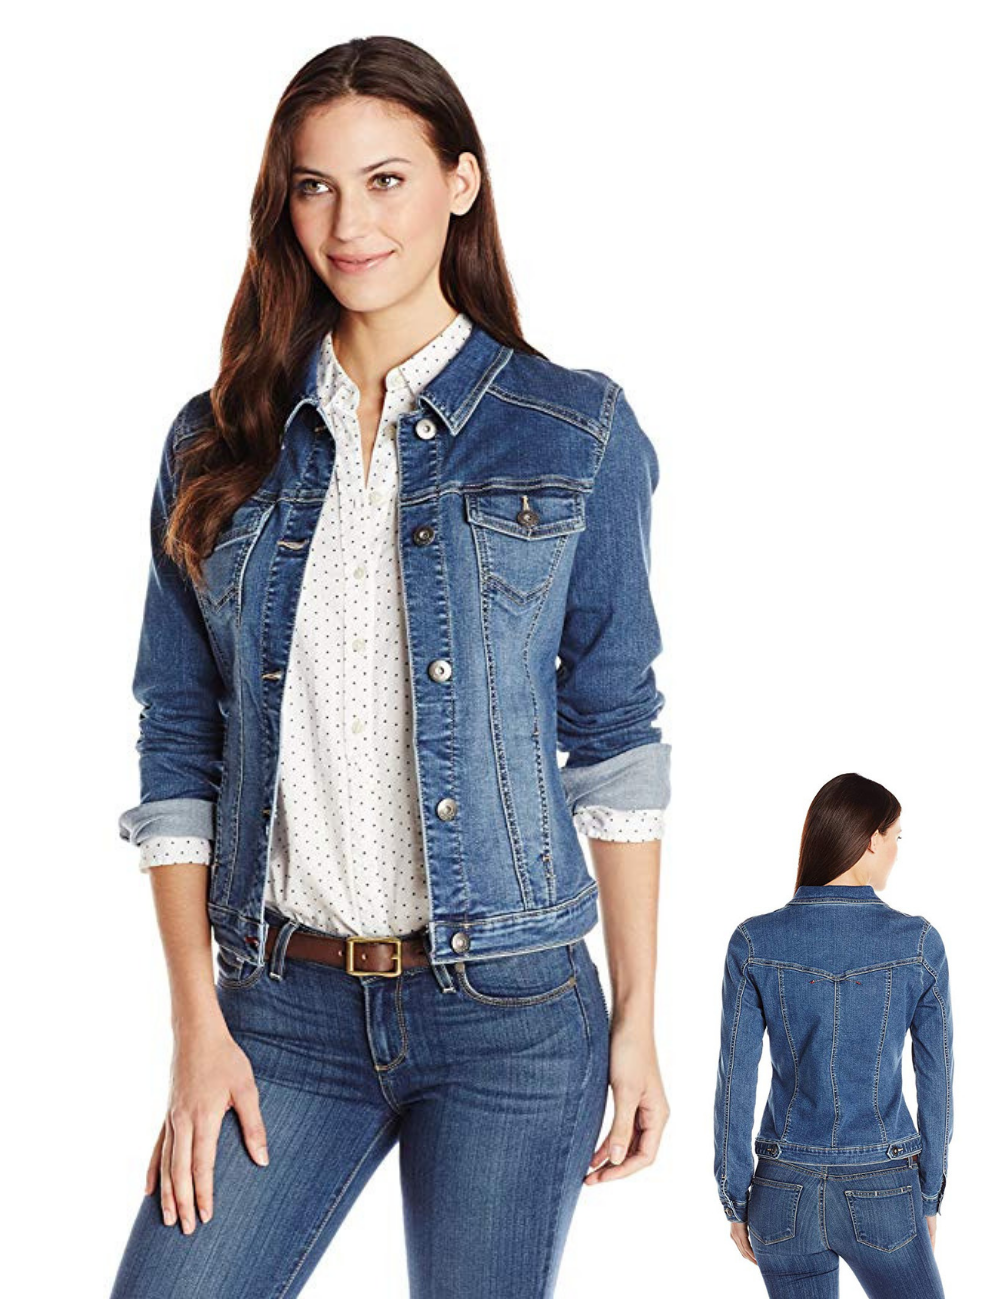 Wrangler Authentics Women S Denim Jacket Streetwear Styling Street Style Denim Jacket Women Denim Women Jackets [ 1300 x 1000 Pixel ]